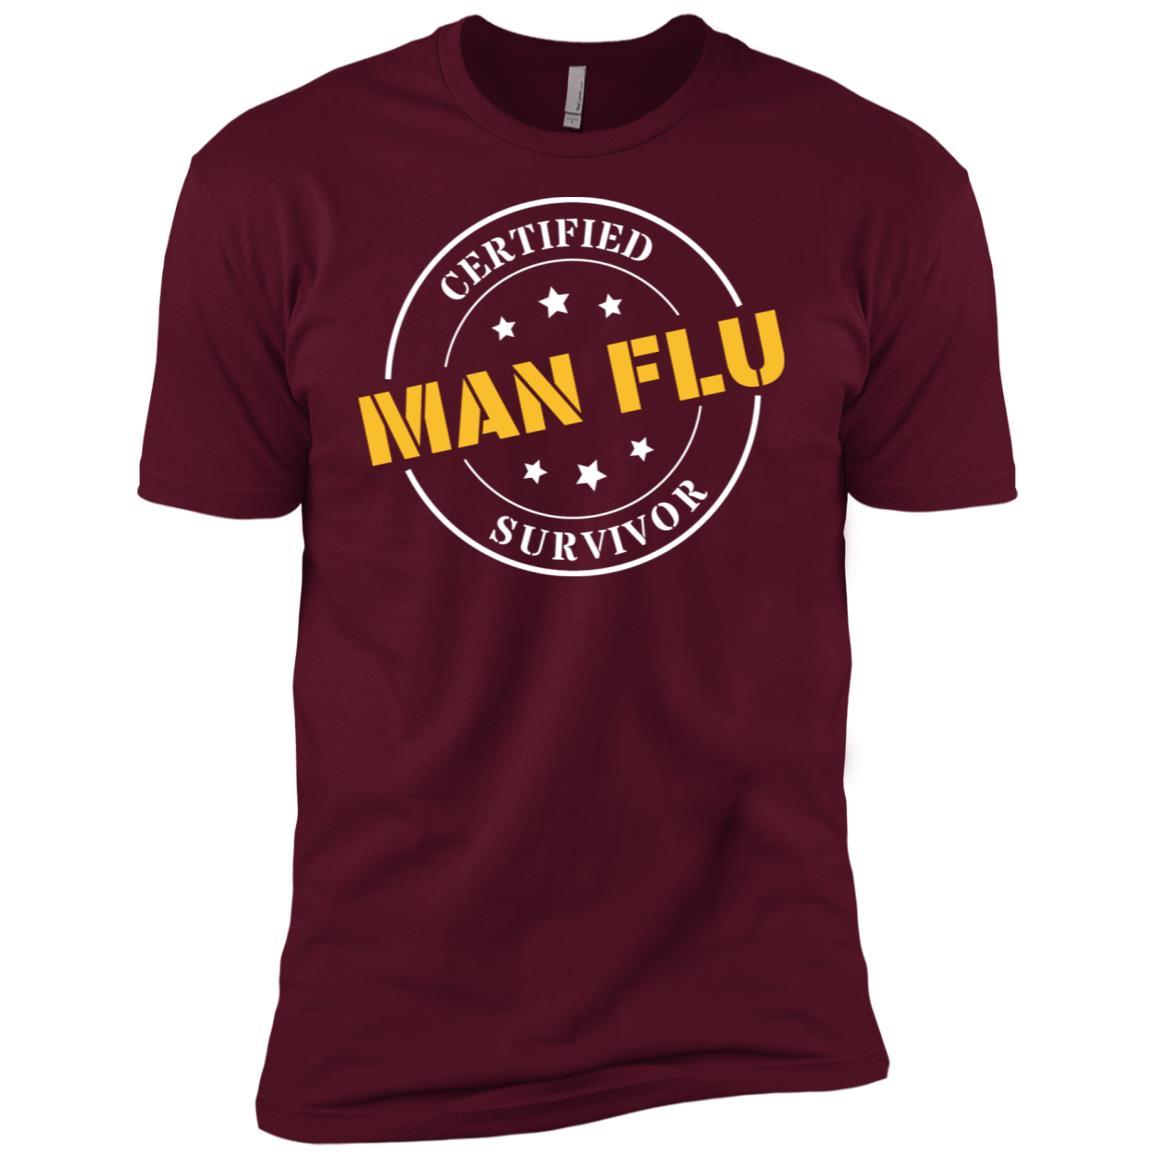 Funny Certified Man Flu Survivor for Fathers Day Men Short Sleeve T-Shirt